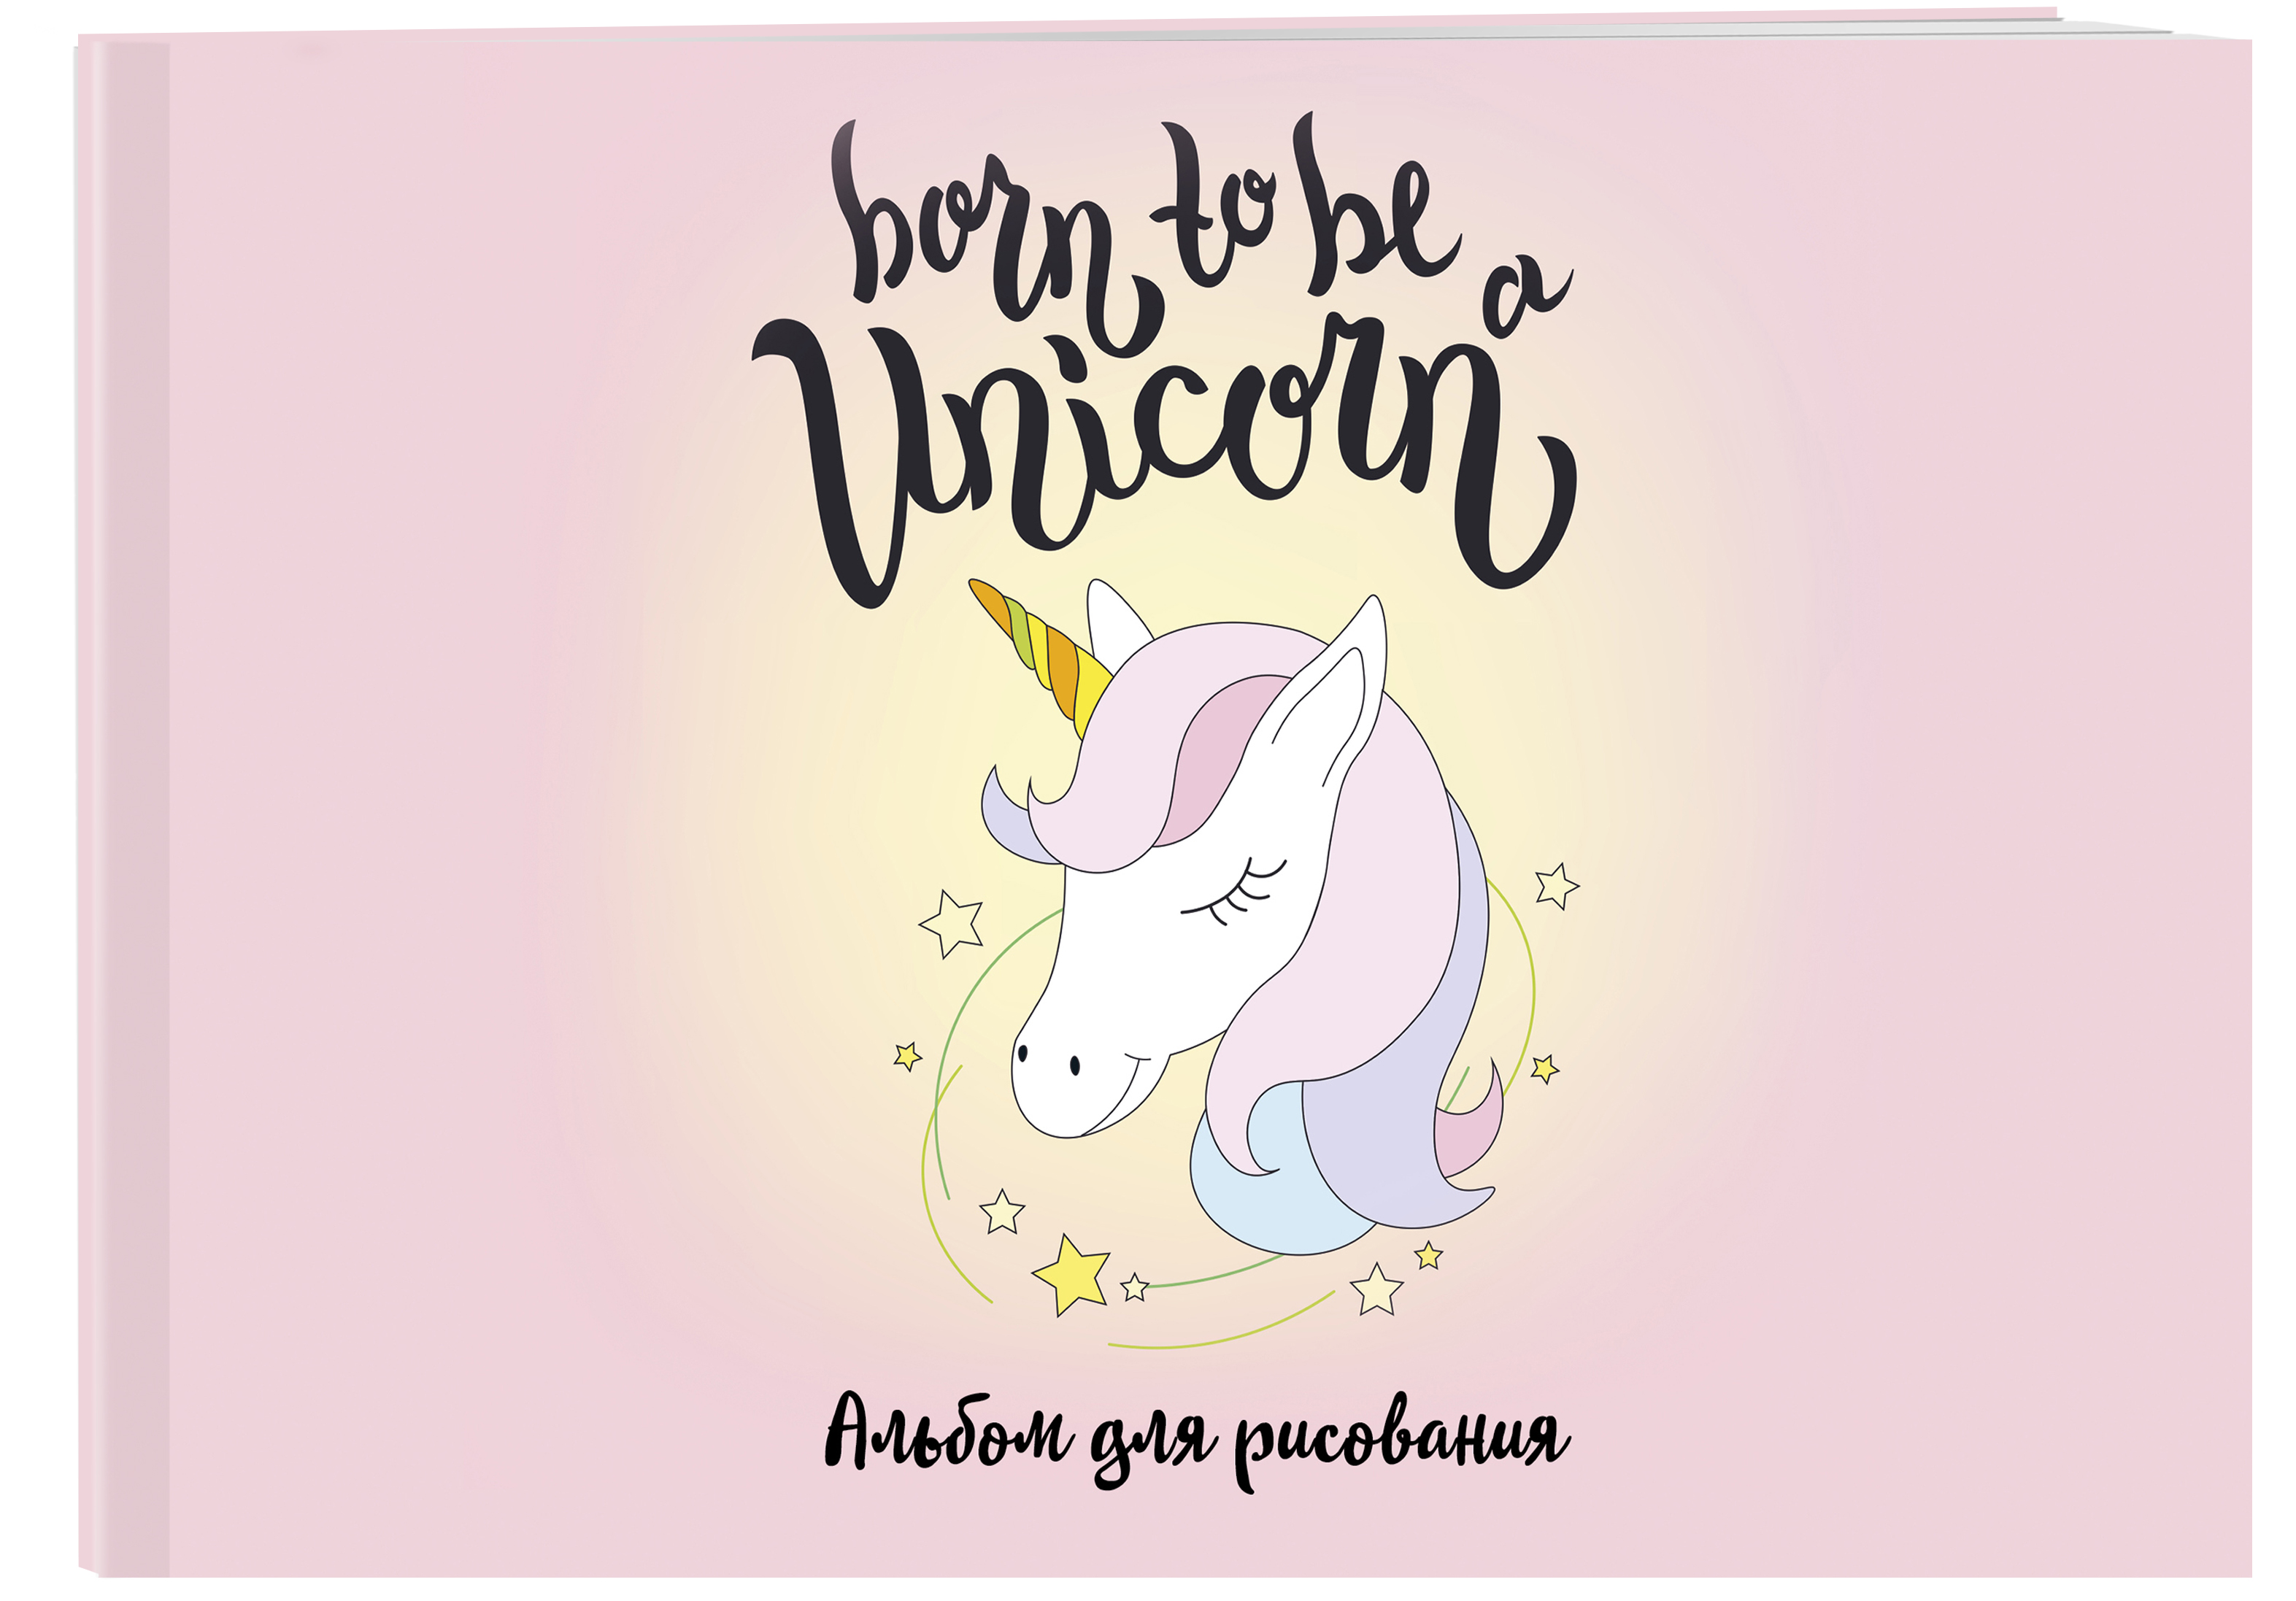 Born to be a unicorn! Альбом для рисования (формат А4, офсет 120 гр., 40 страниц, на скрепке)